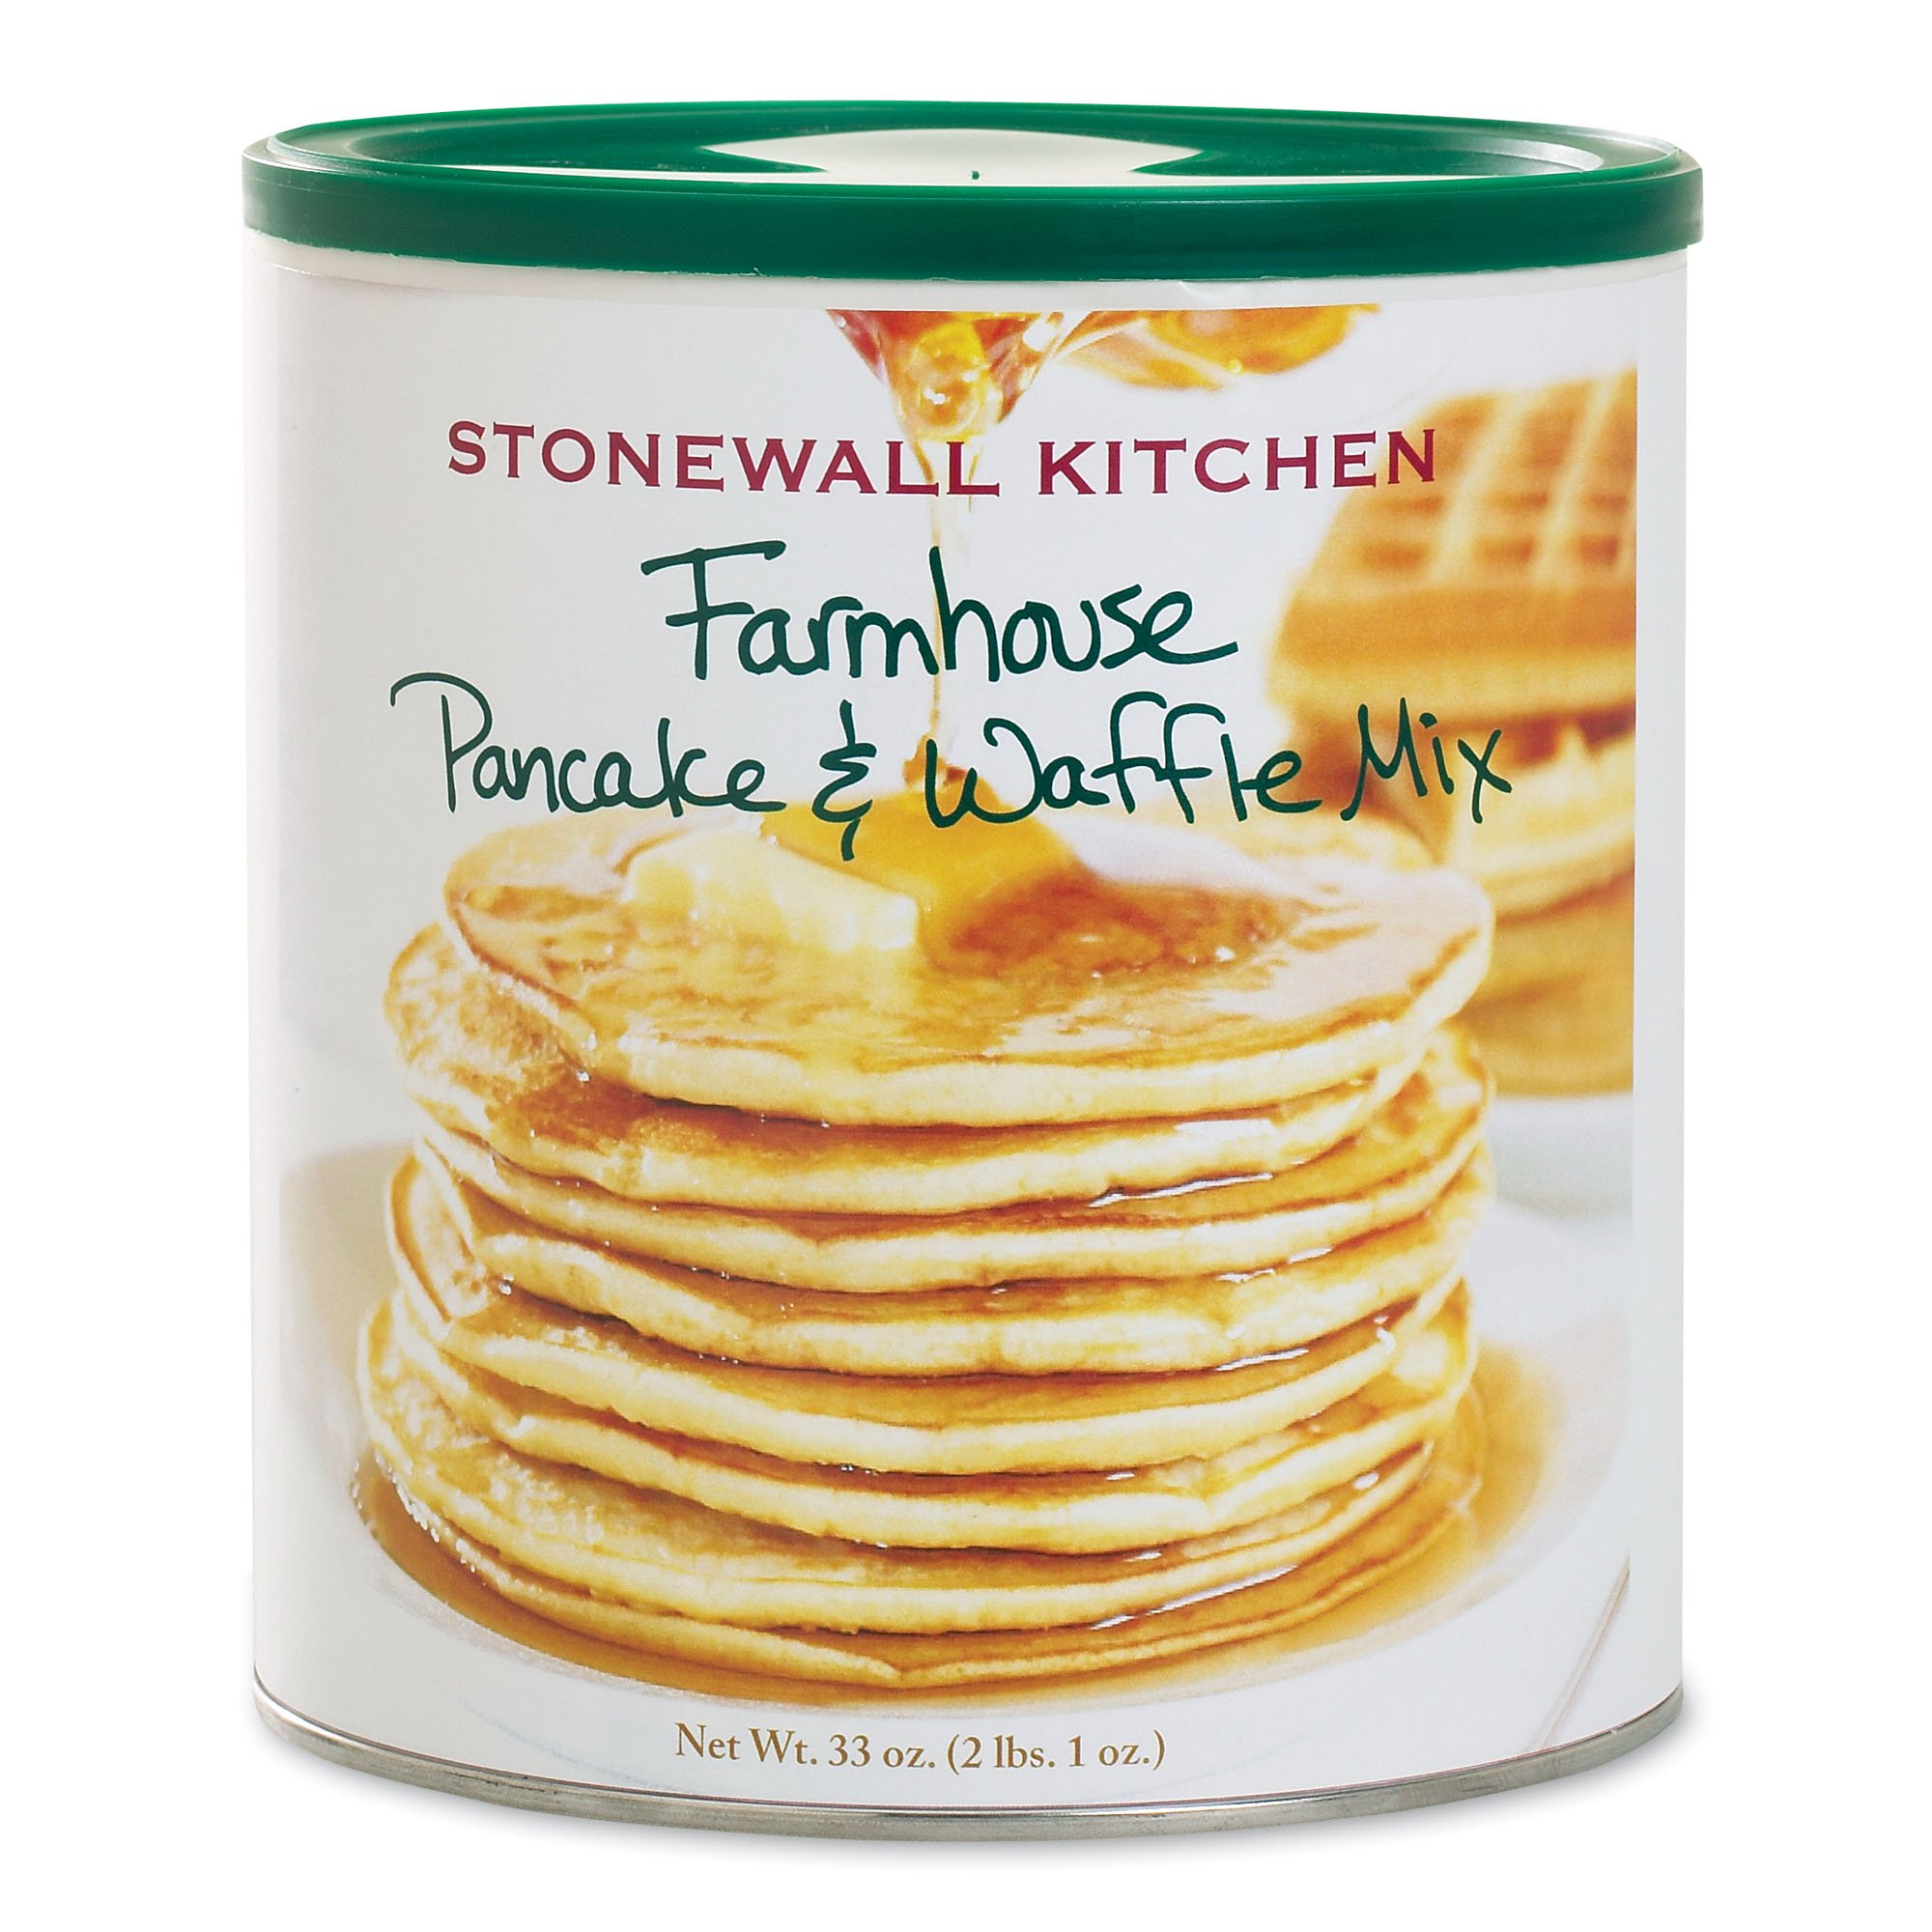 Stonewall Kitchen Farmhouse Pancake & Waffle Mix, 33 oz by Stonewall Kitchen (Image #1)